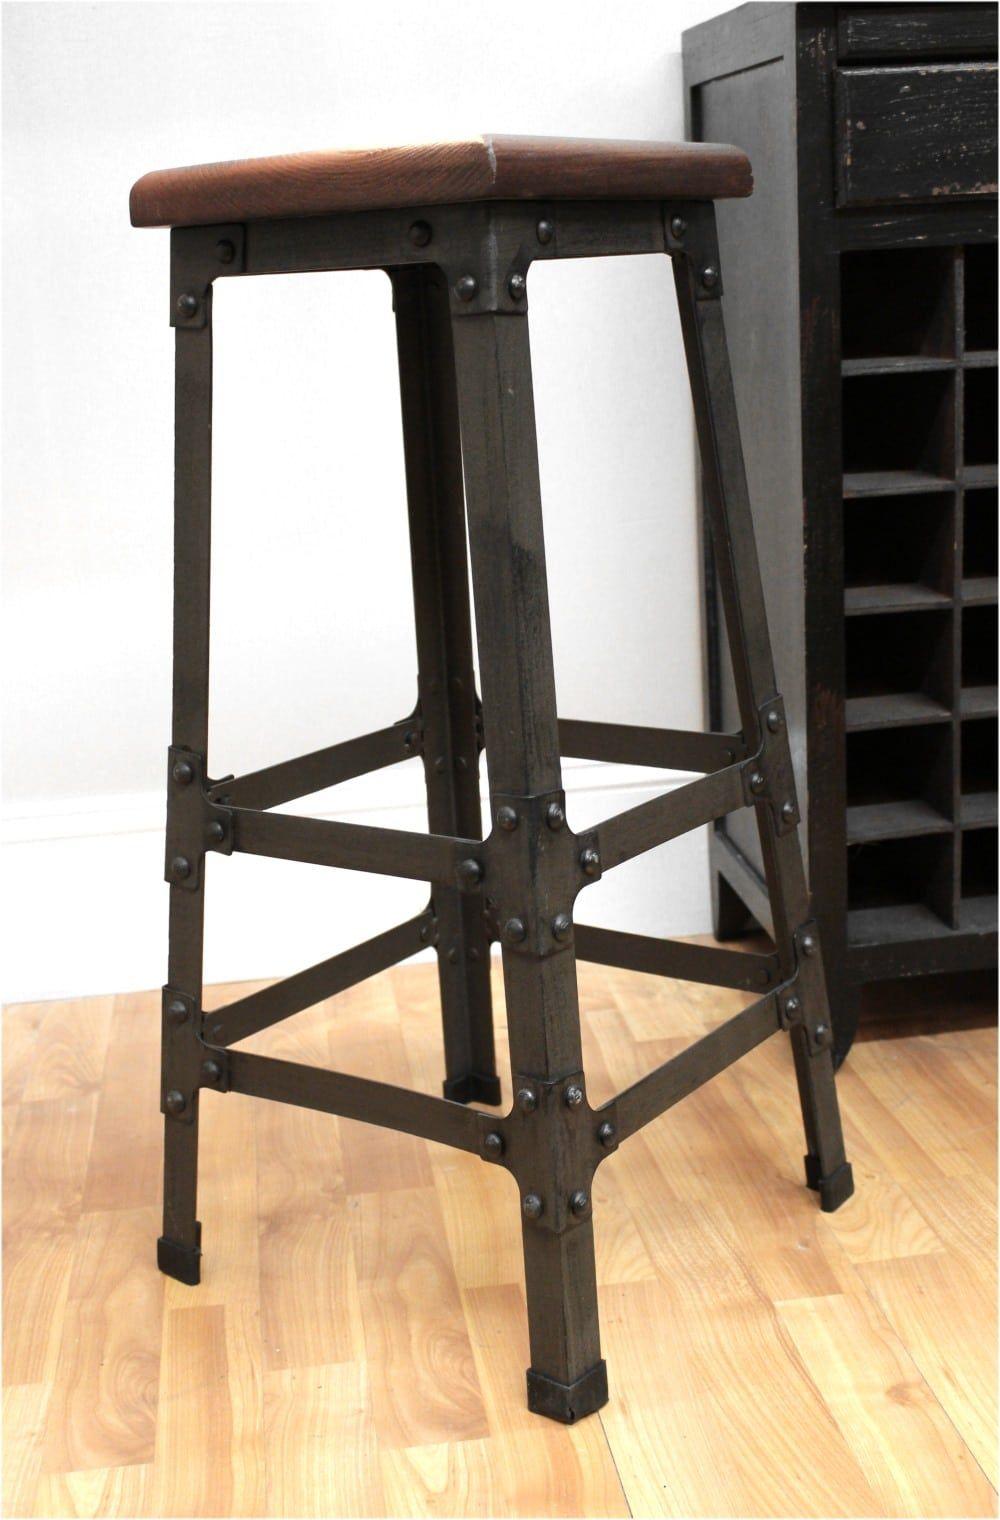 Bar Stool With Wooden Seat Amp Riveted Iron Legs Home Bar Furniture Or Business Sillas De Bar Muebles De Hierro Taburete